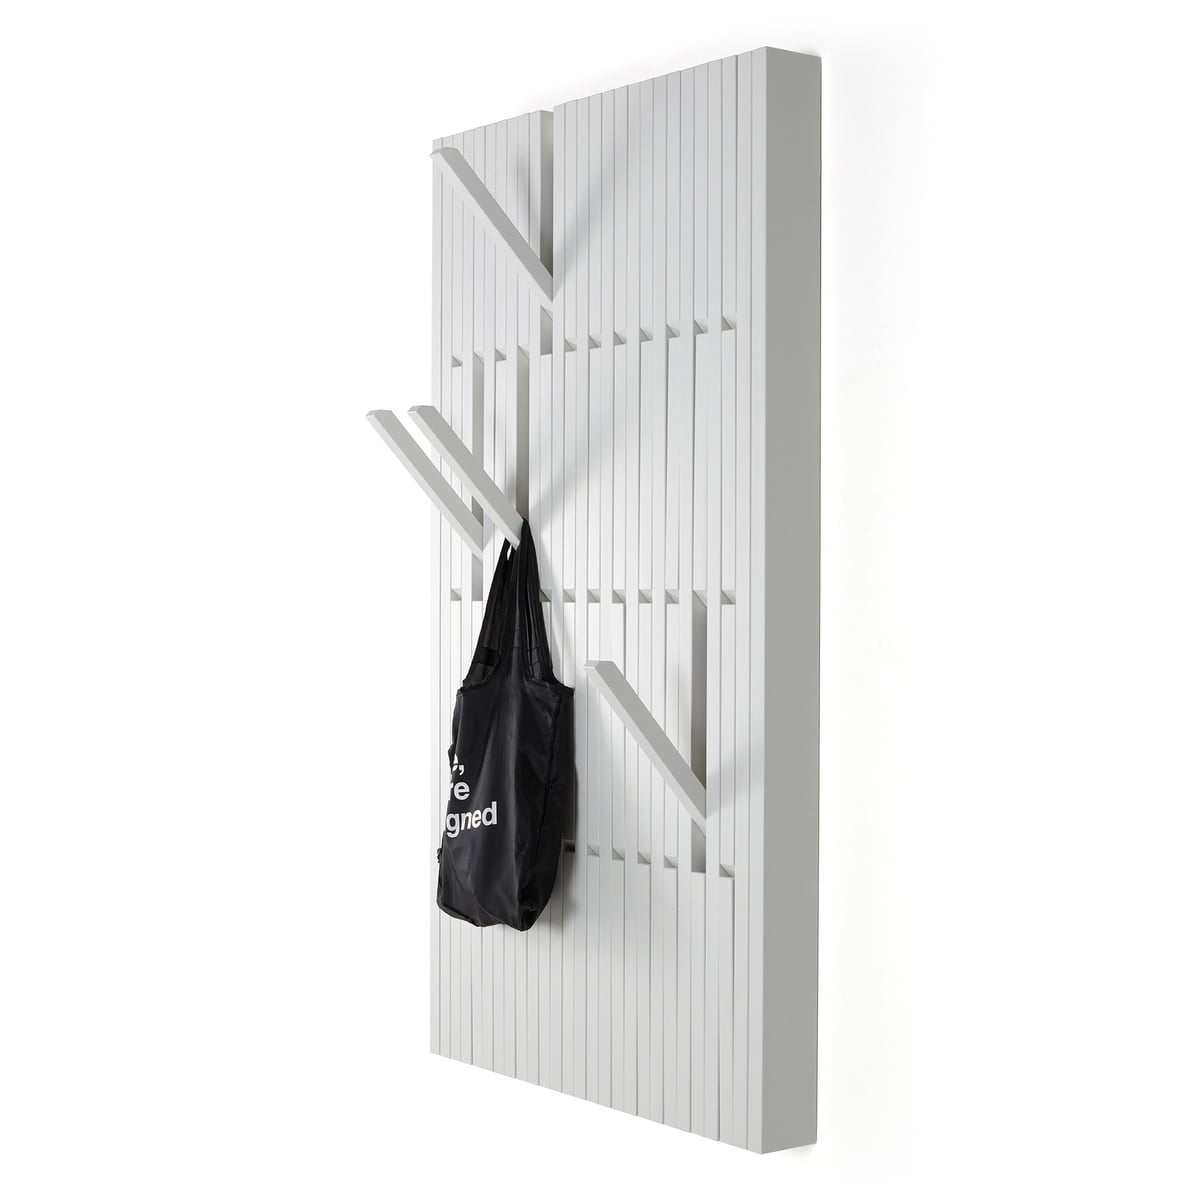 Wondrous Peruse Piano Hanger Beech White Ral 9010 Large Download Free Architecture Designs Rallybritishbridgeorg